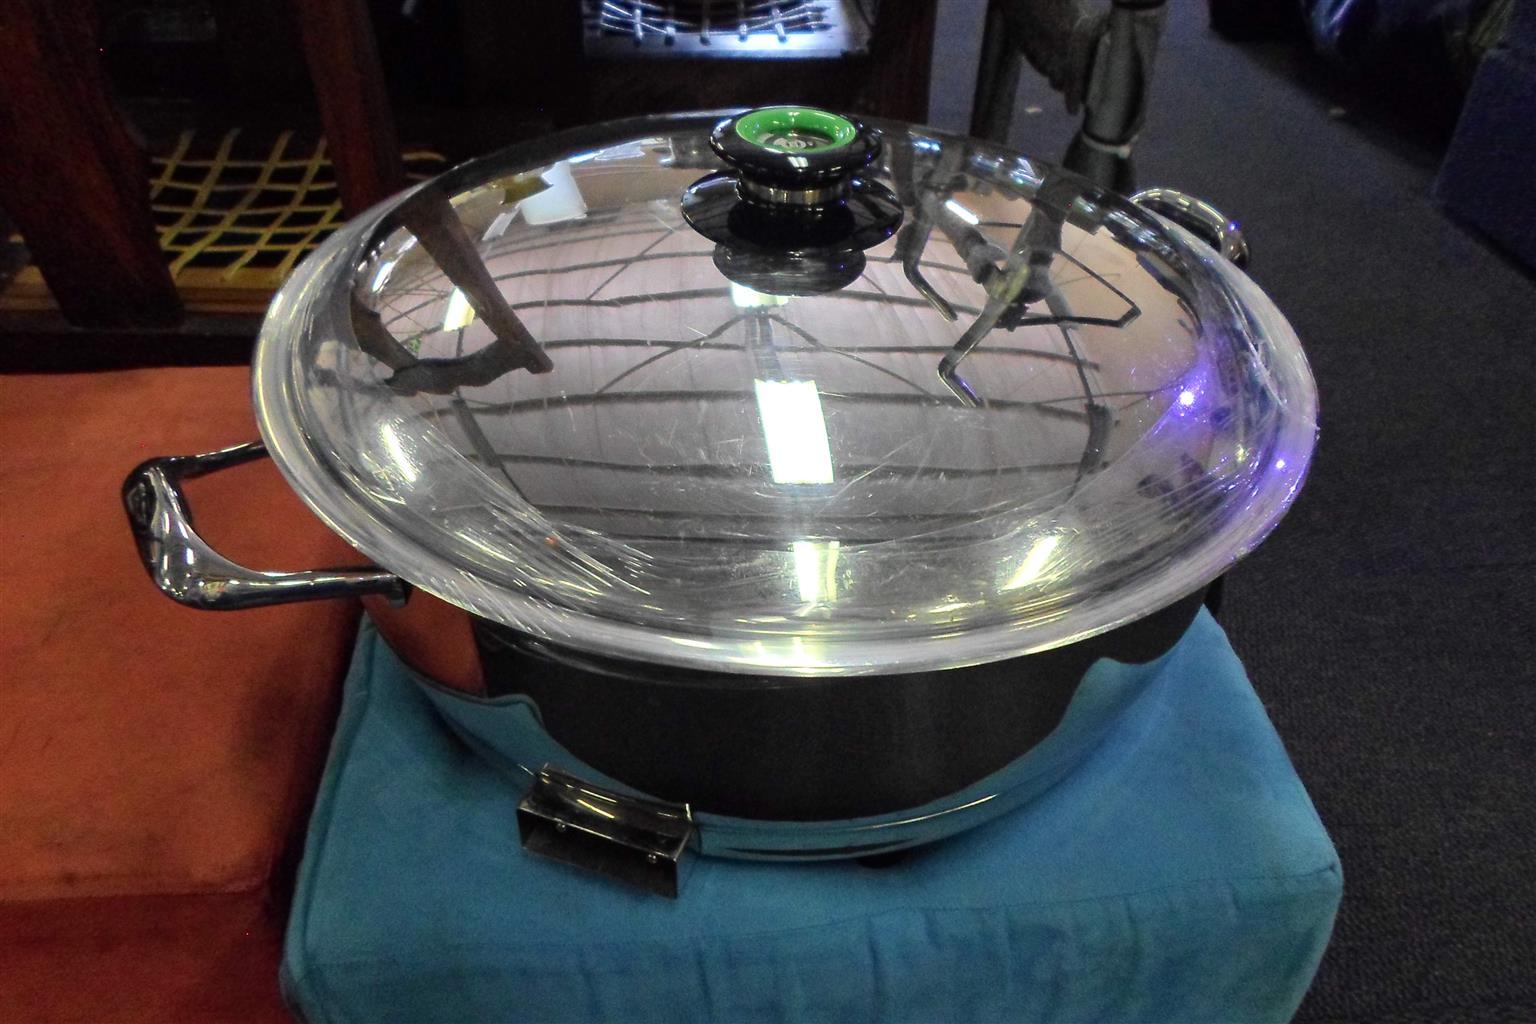 40cm AMC Electric Frying Pan